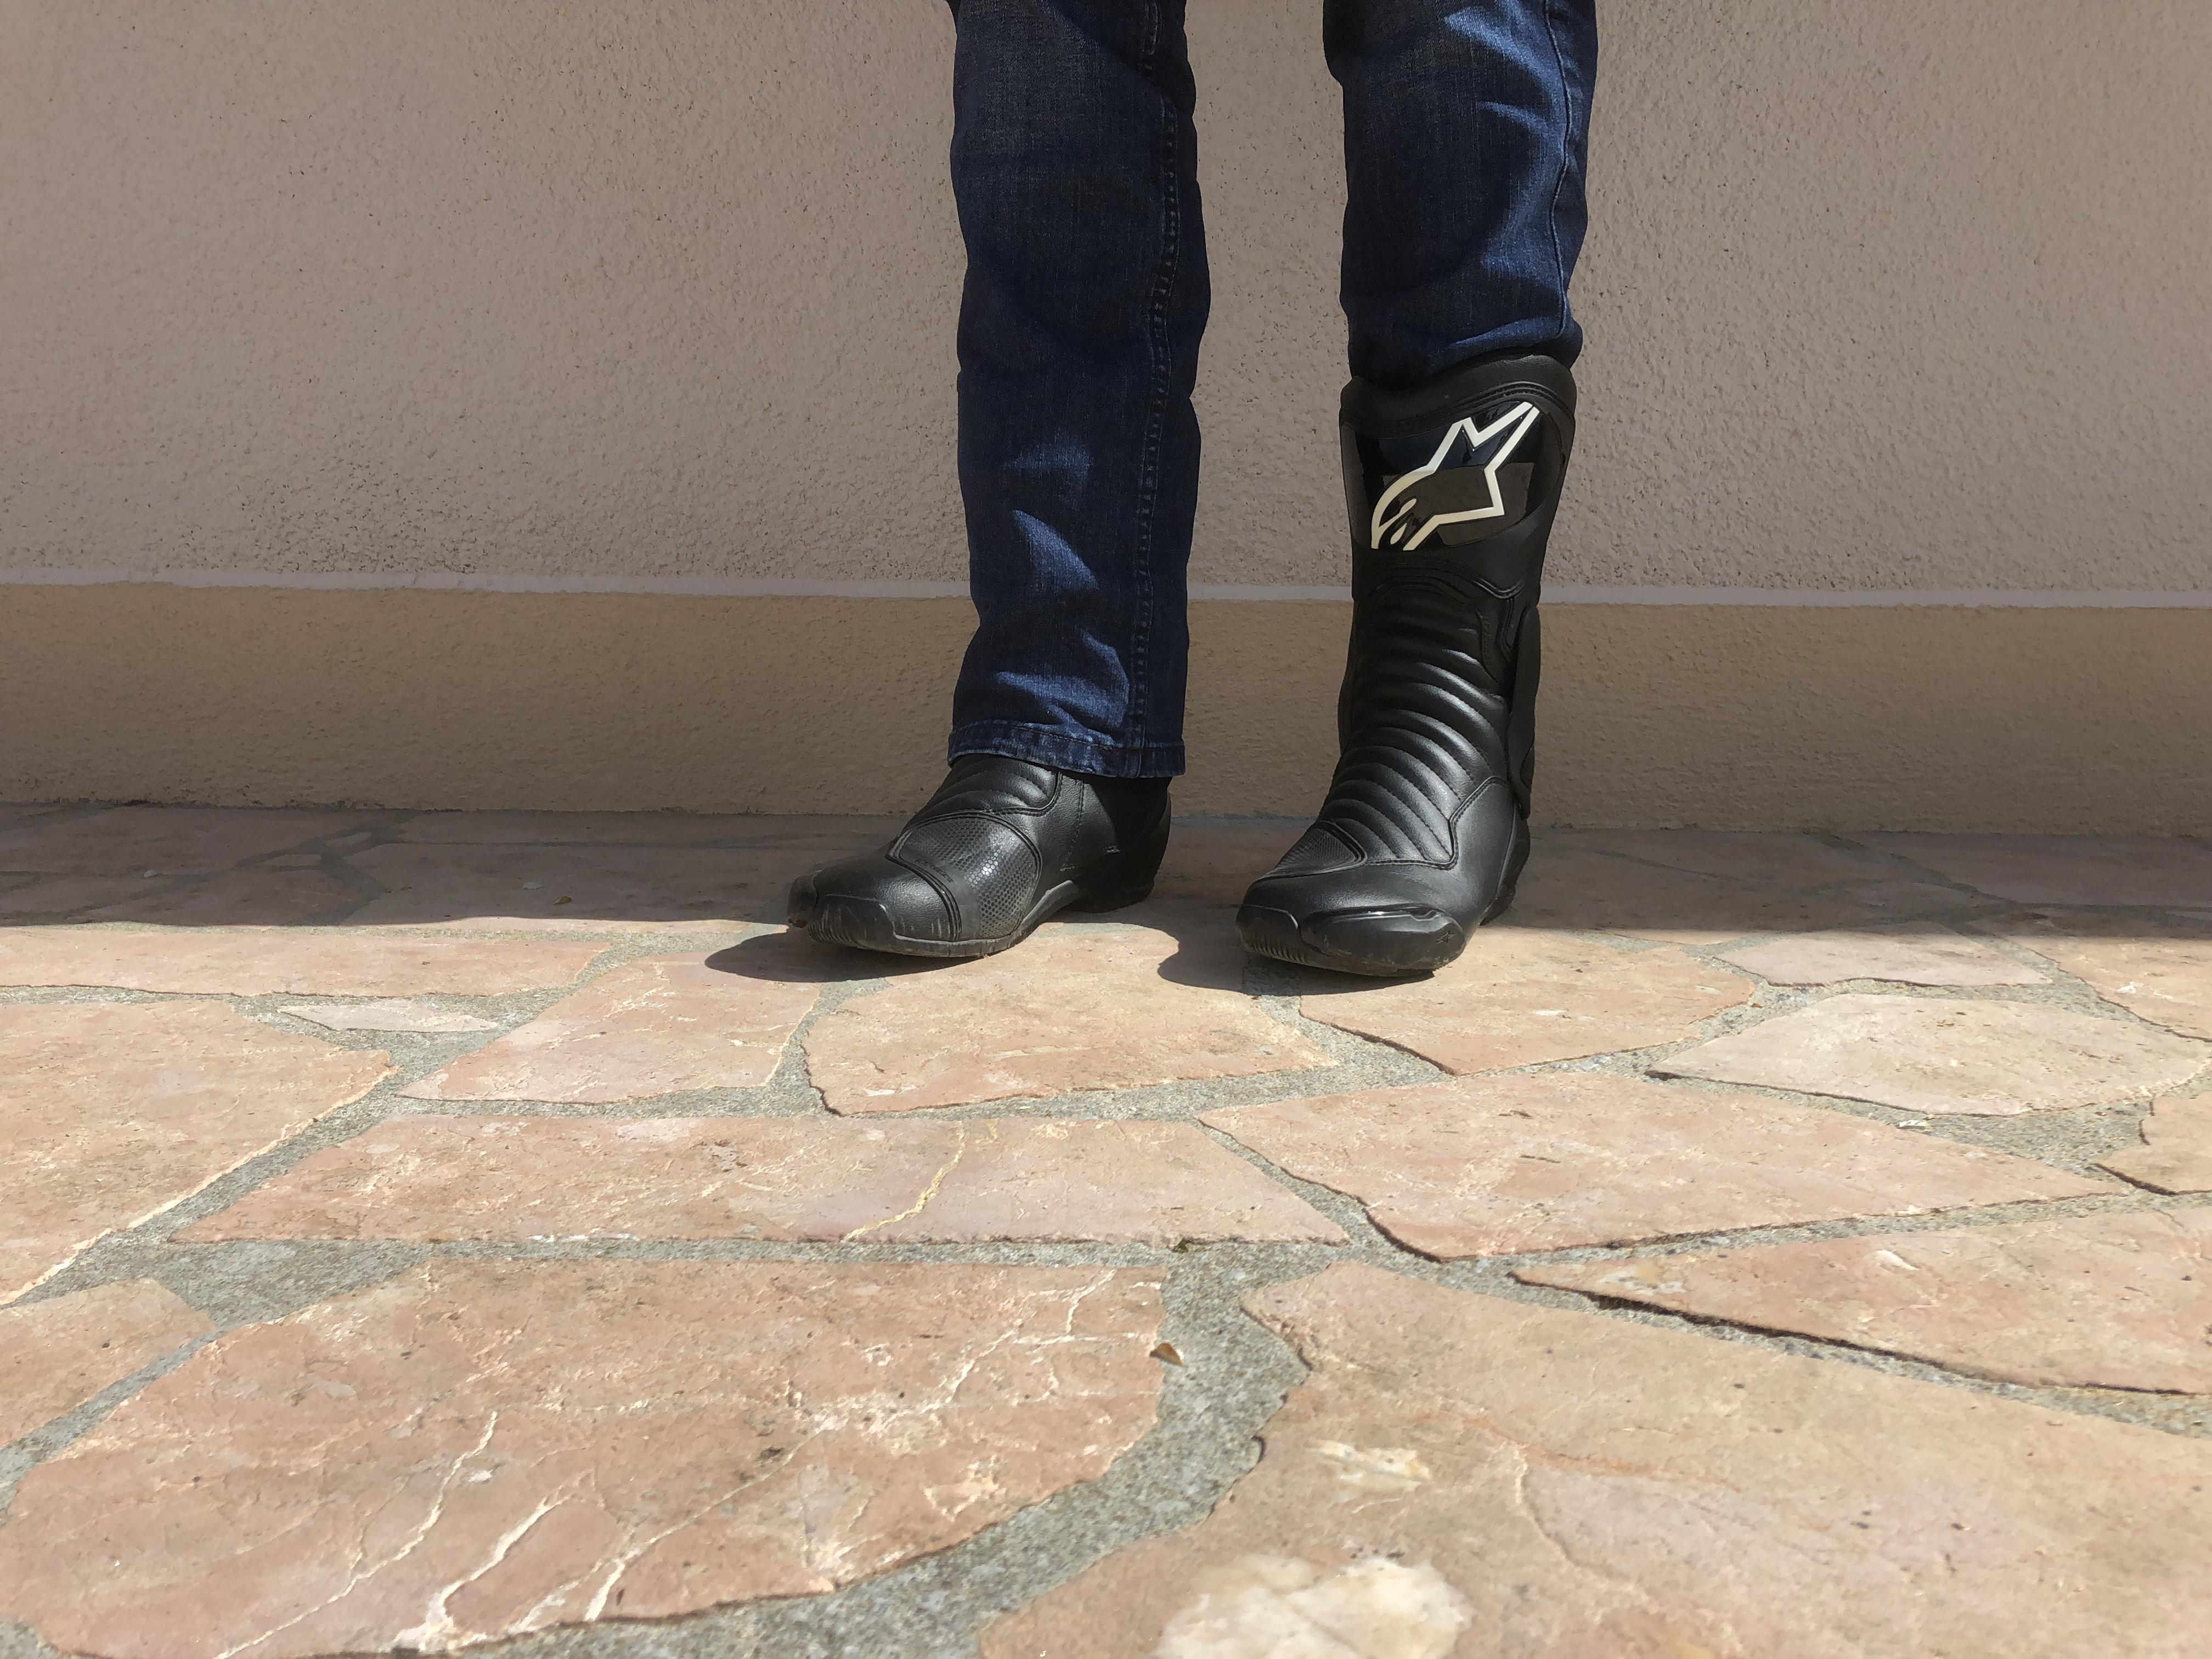 Bottes Alpinestars SMX 6 V2 : les bottes ou plutôt les